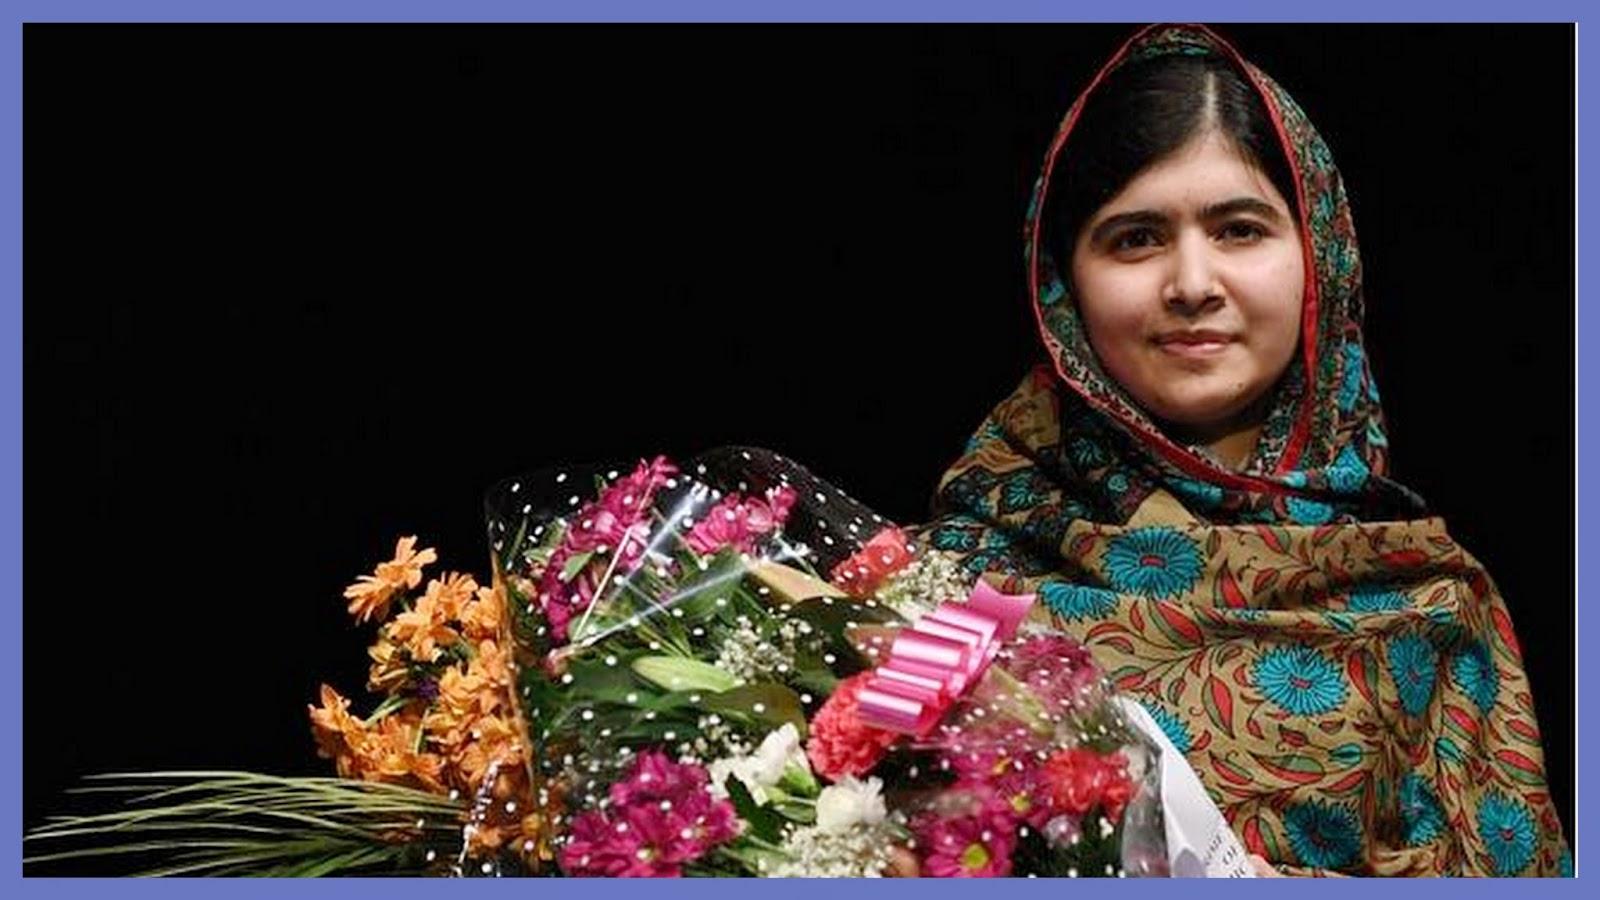 Malala Yousafzai Wallpaper 15   1600 X 900 stmednet 1600x900